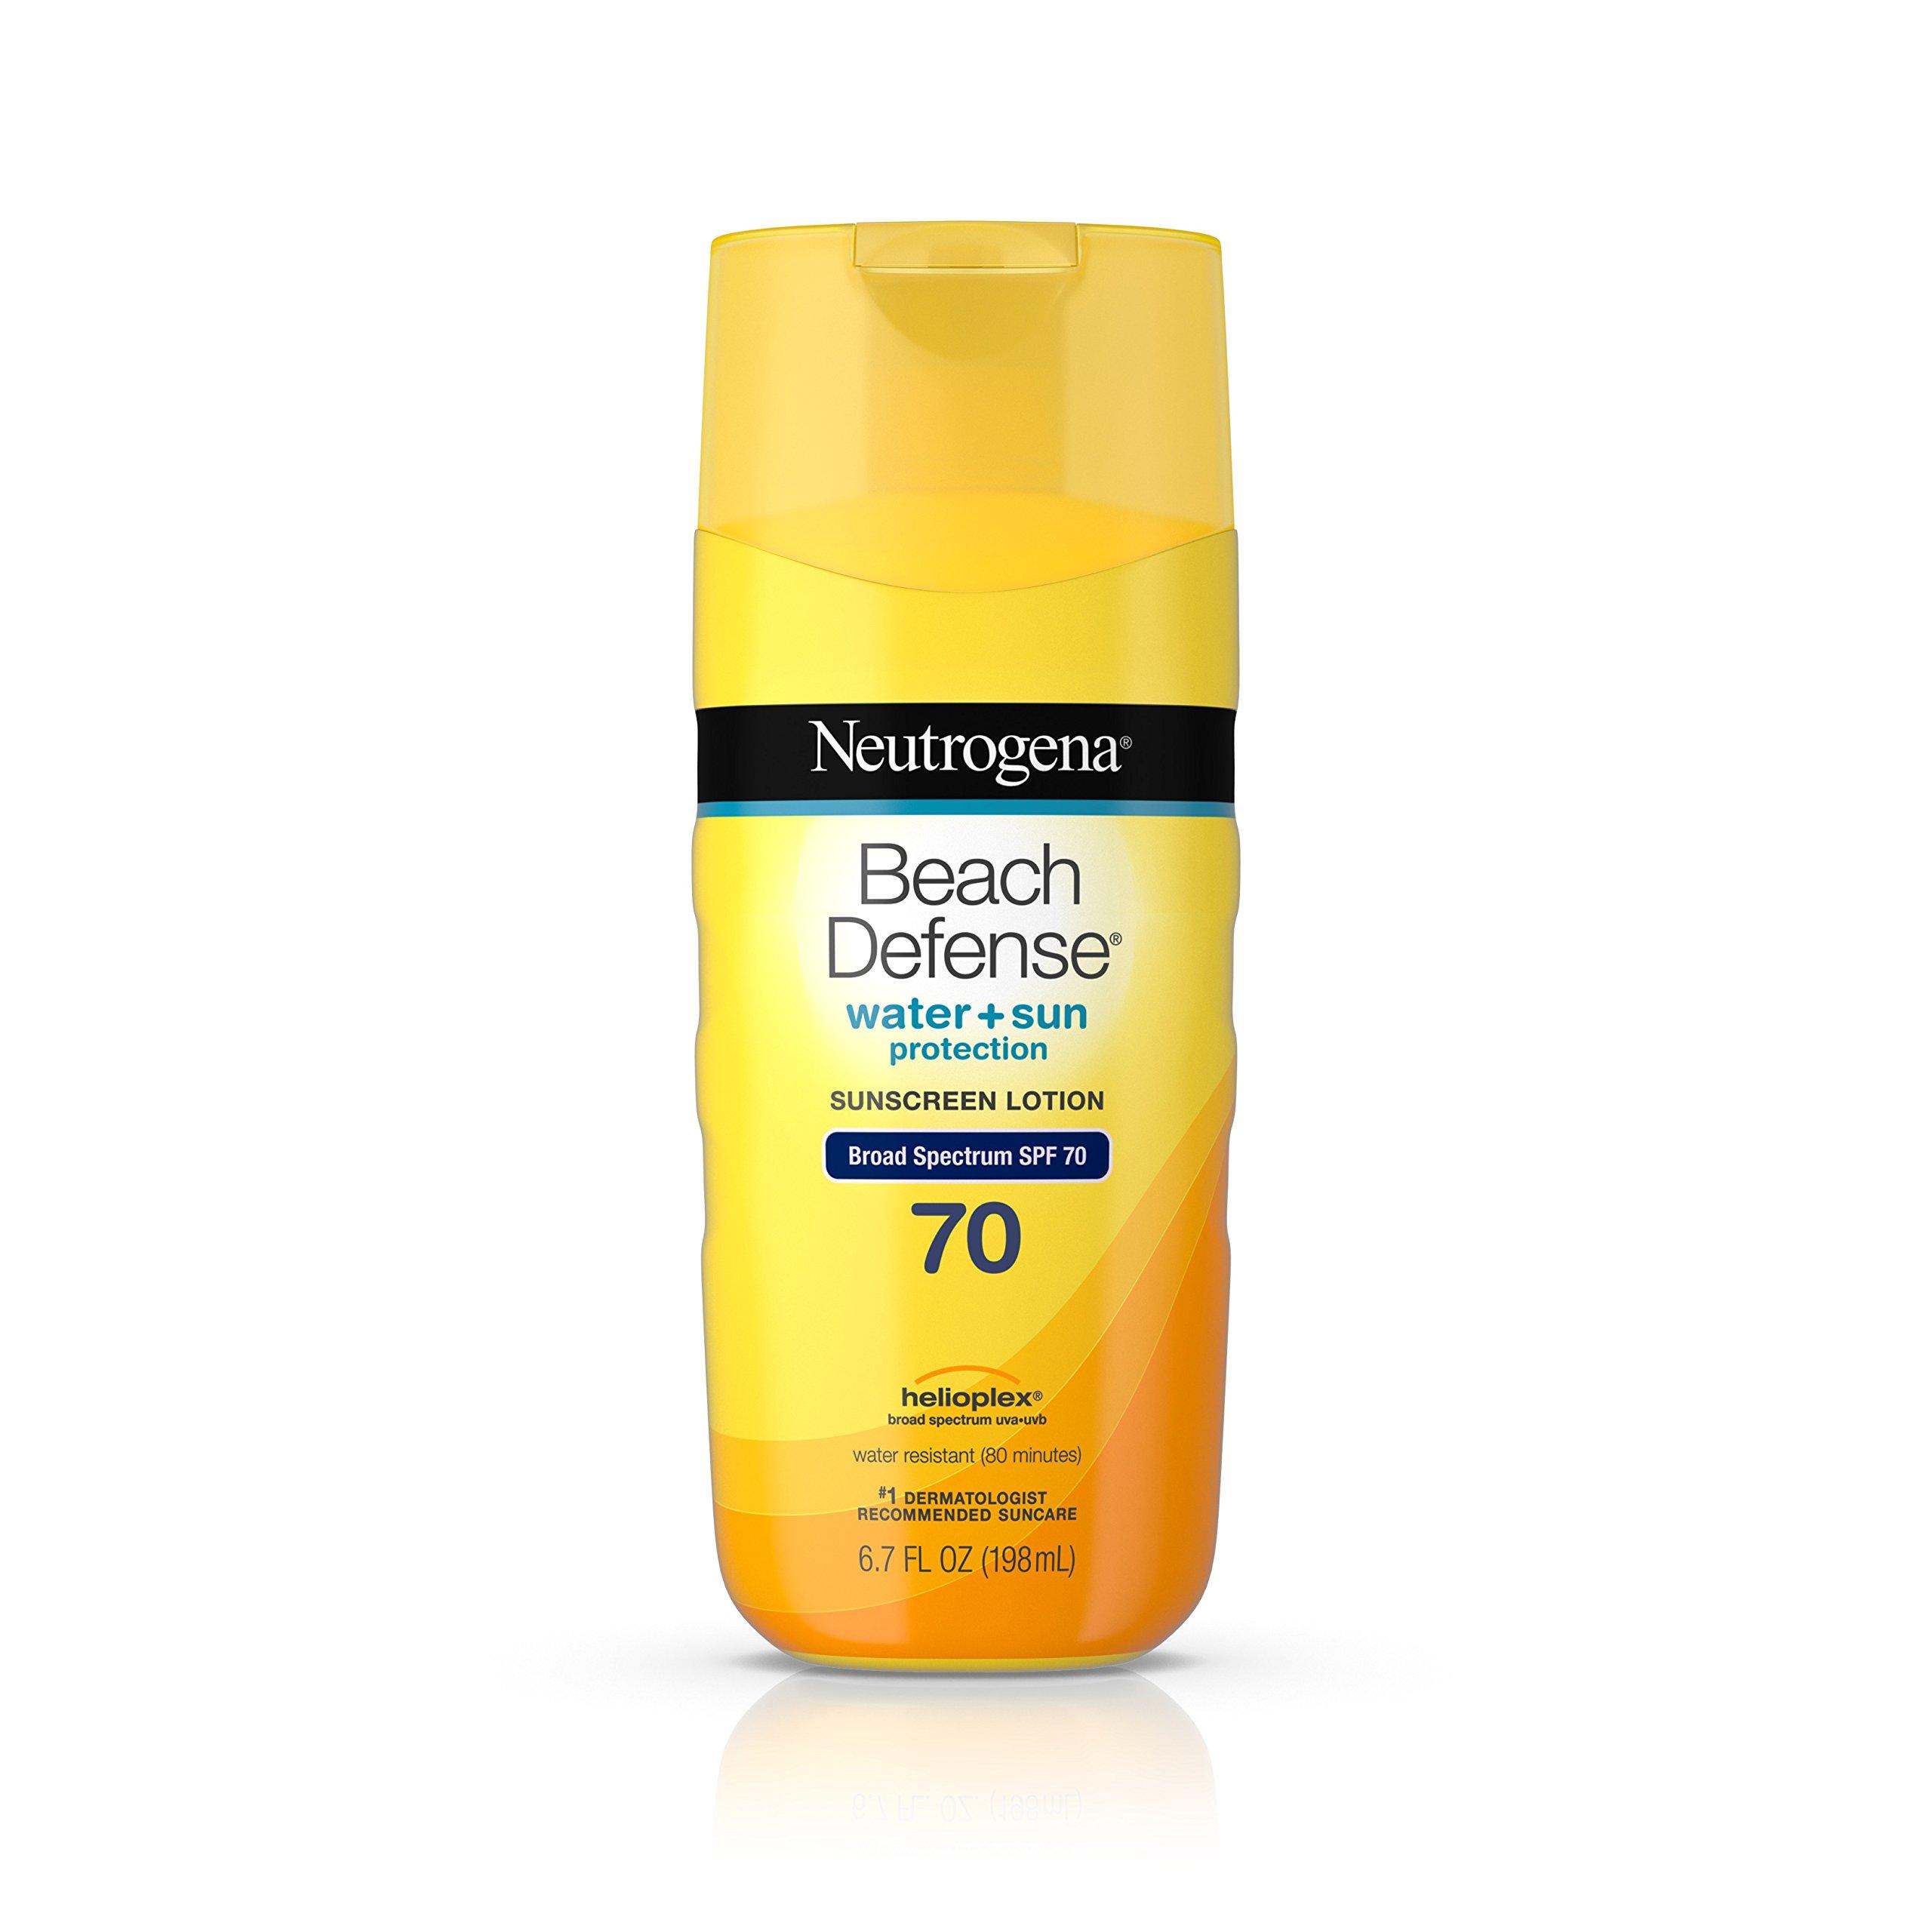 Neutrogena Beach Defense Sunscreen Body Lotion Broad Spectrum Spf 70, 6.7 Oz.